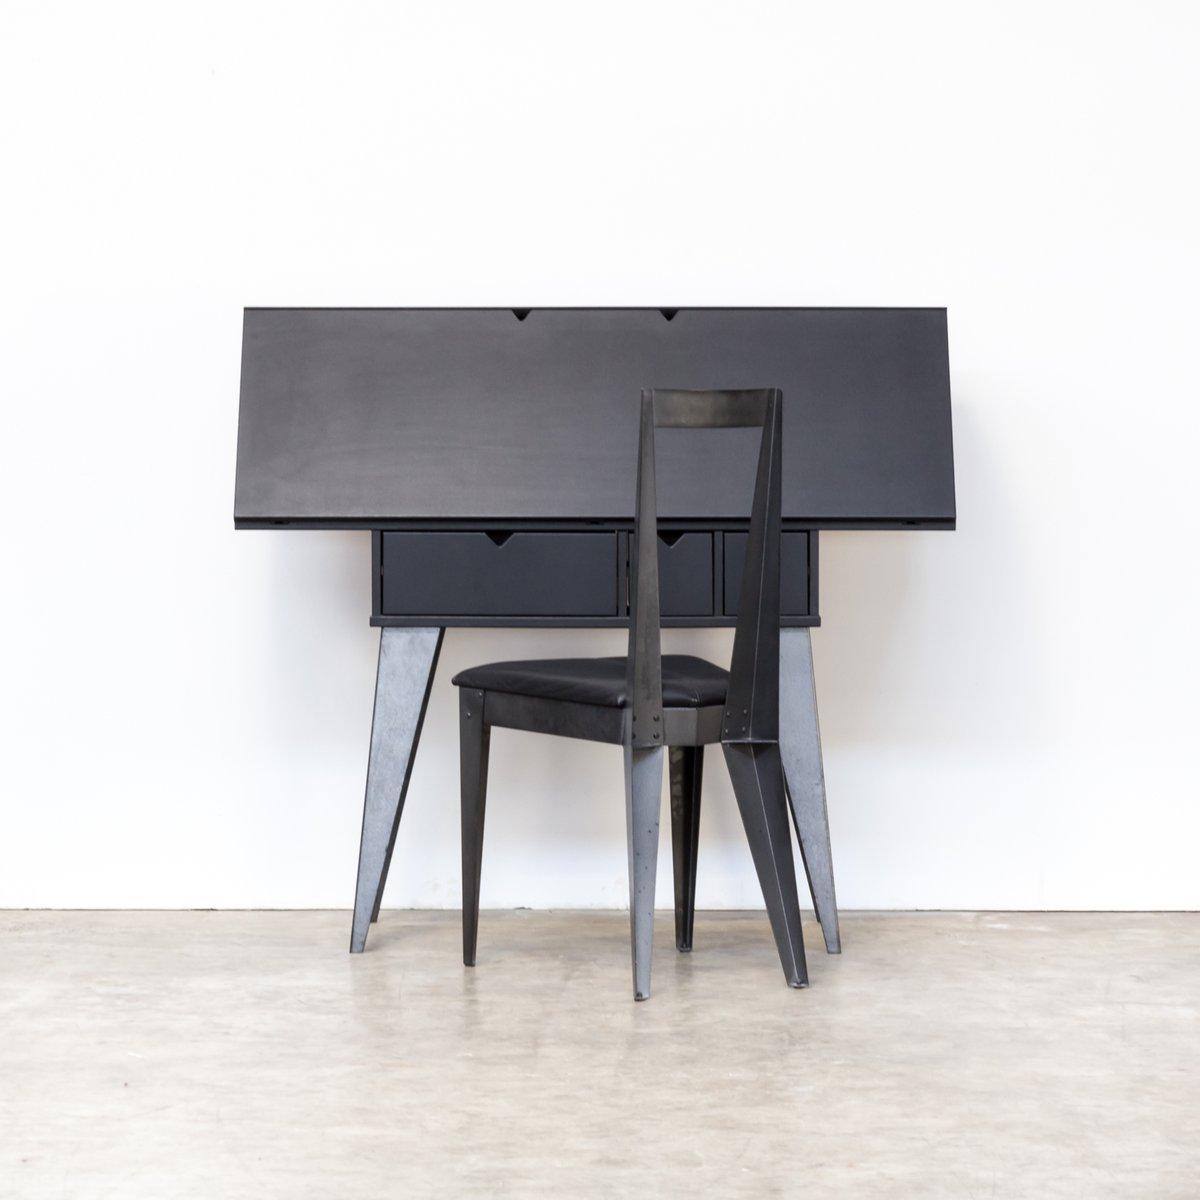 Möbel Sekretär Ikea Buztic Sekretär Möbel Schweiz Design Inspiration